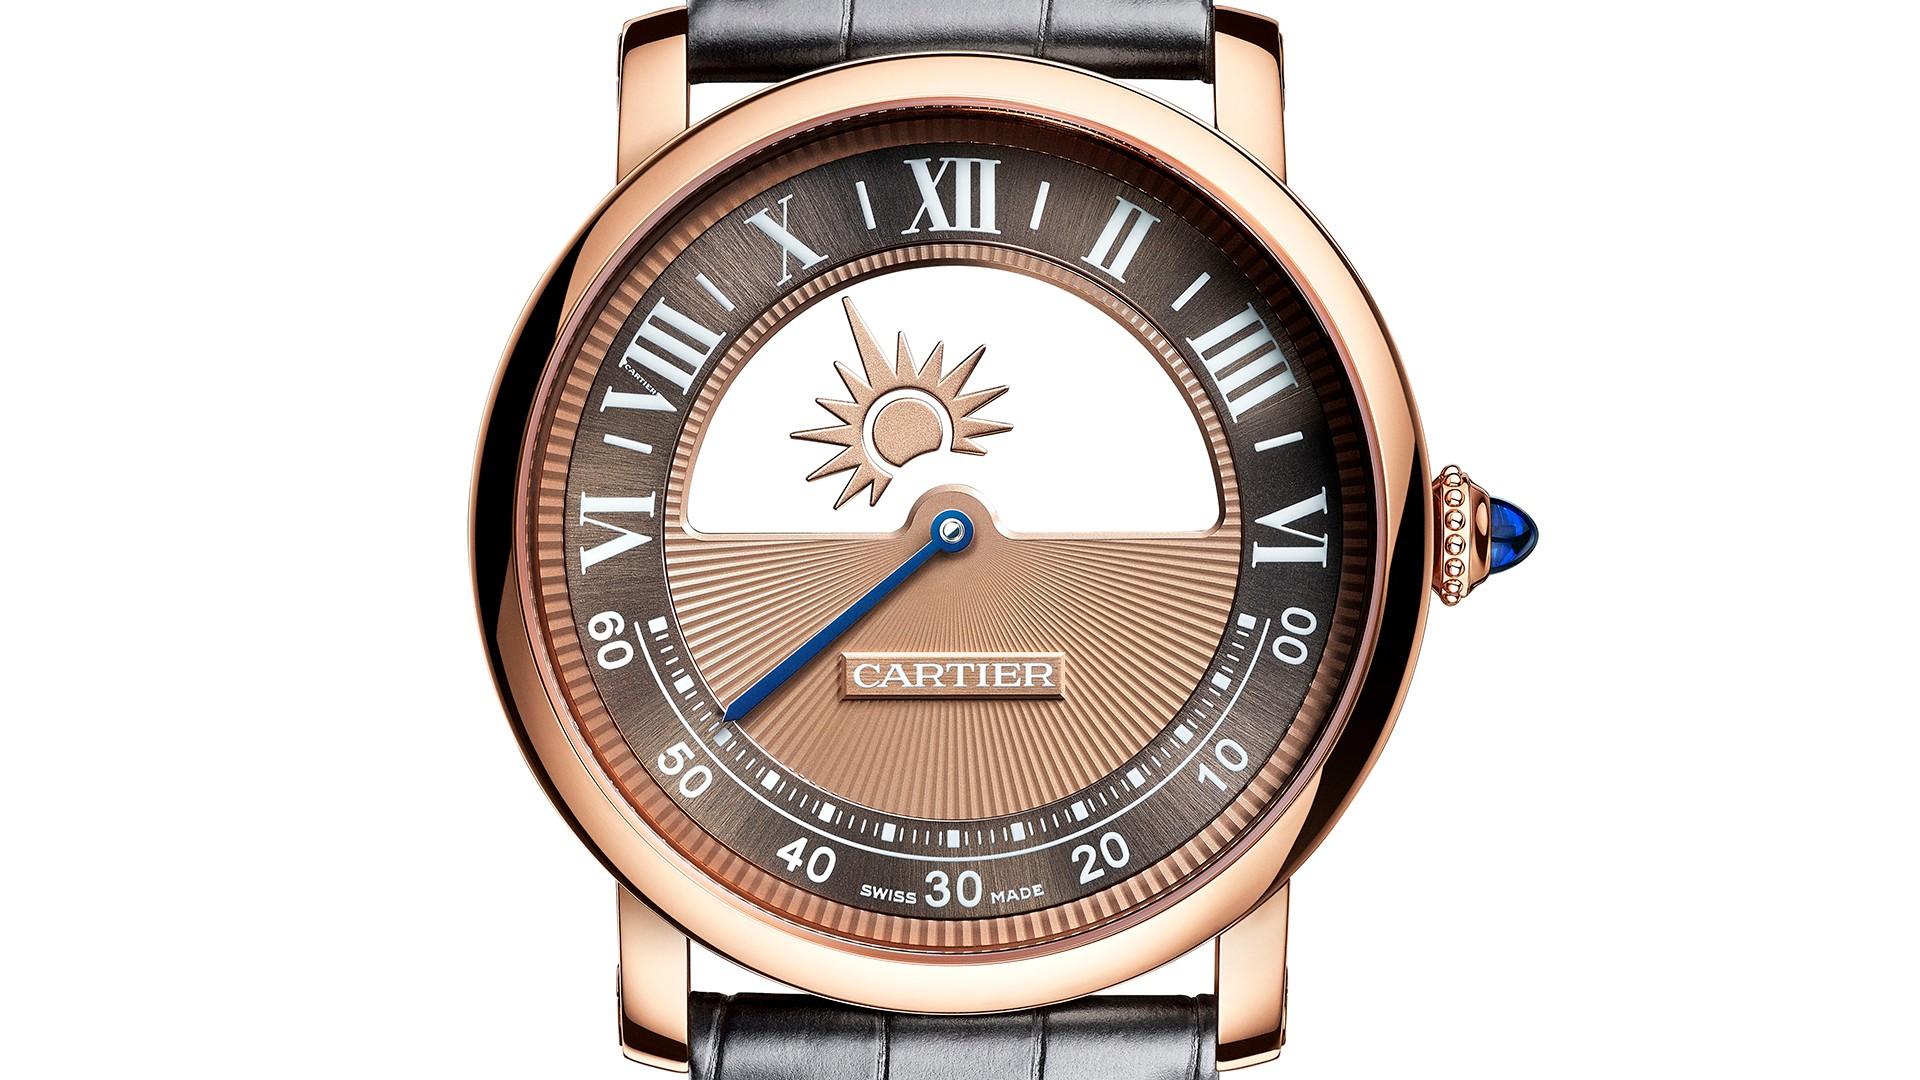 Cartier Rotonde de Cartier Mysterious Day & Night watch